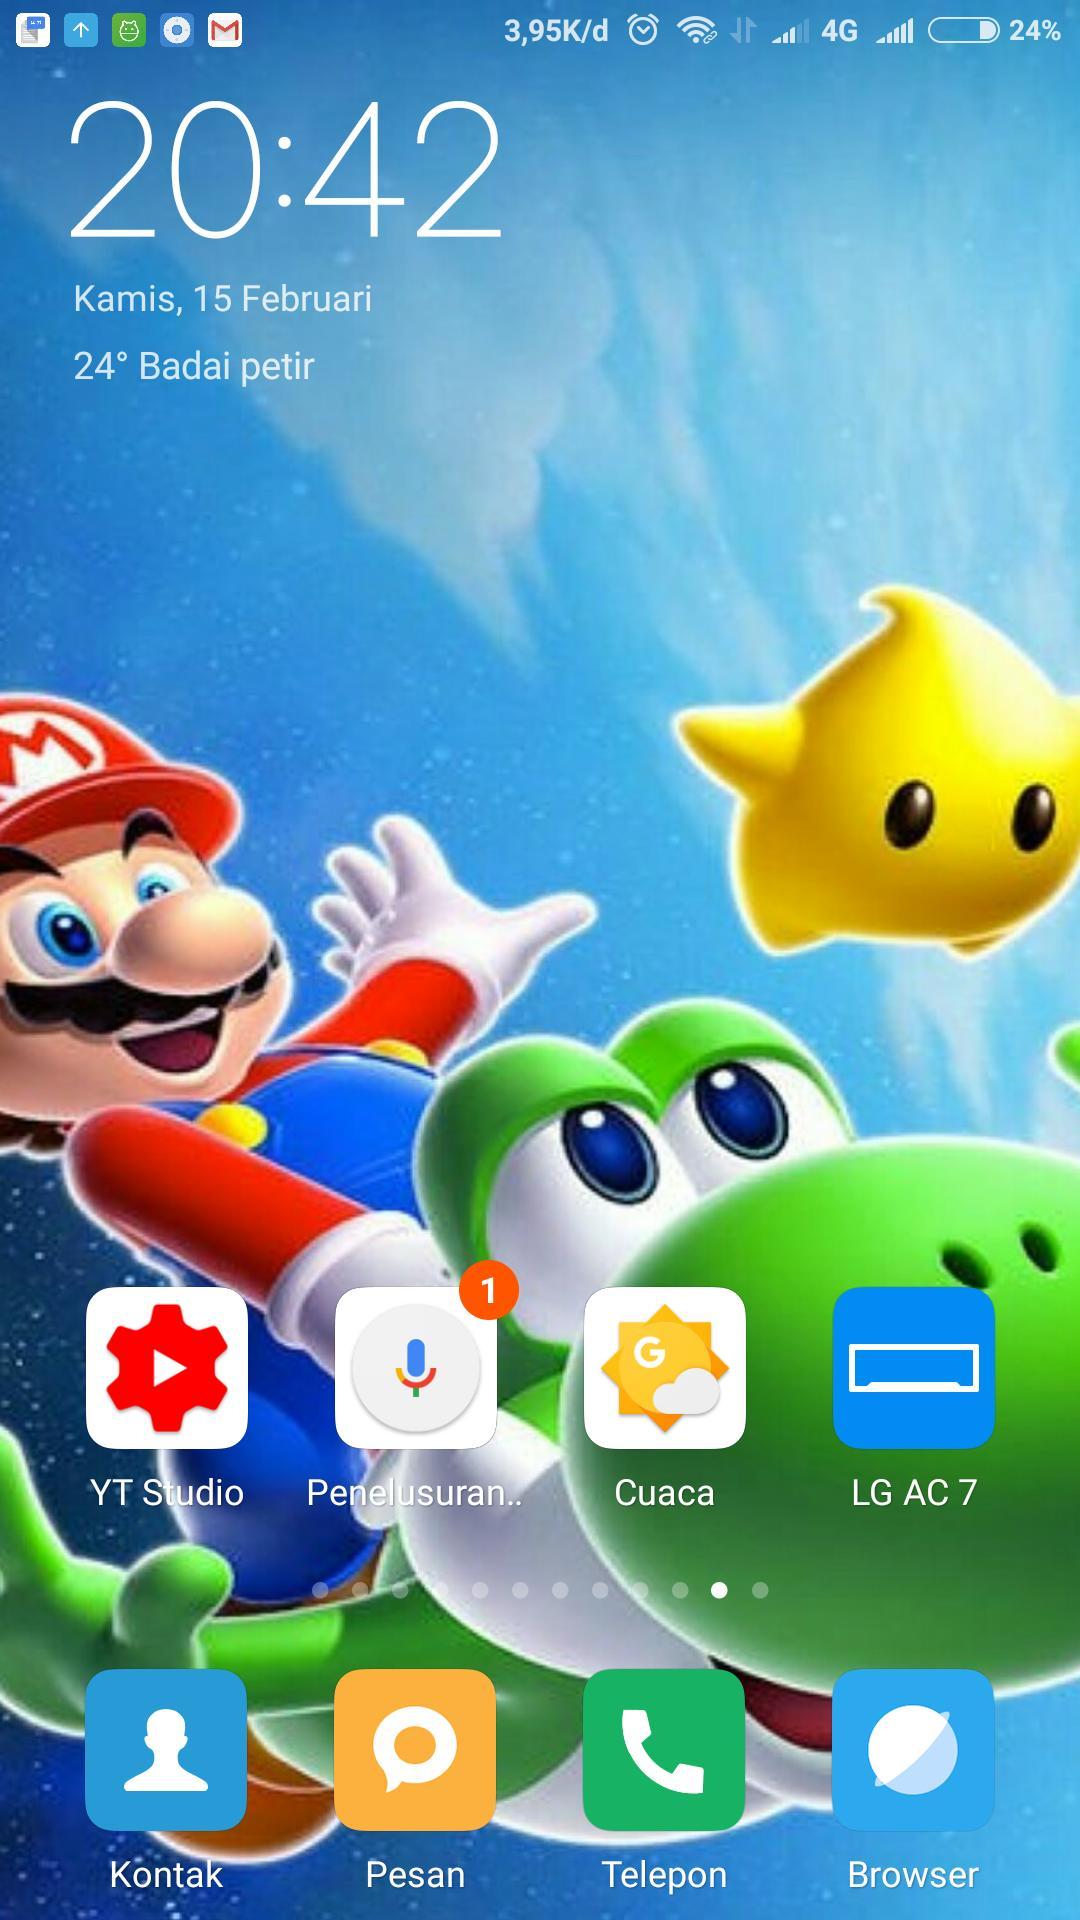 Super Mario Bros Wallpaper Hd For Android Apk Download